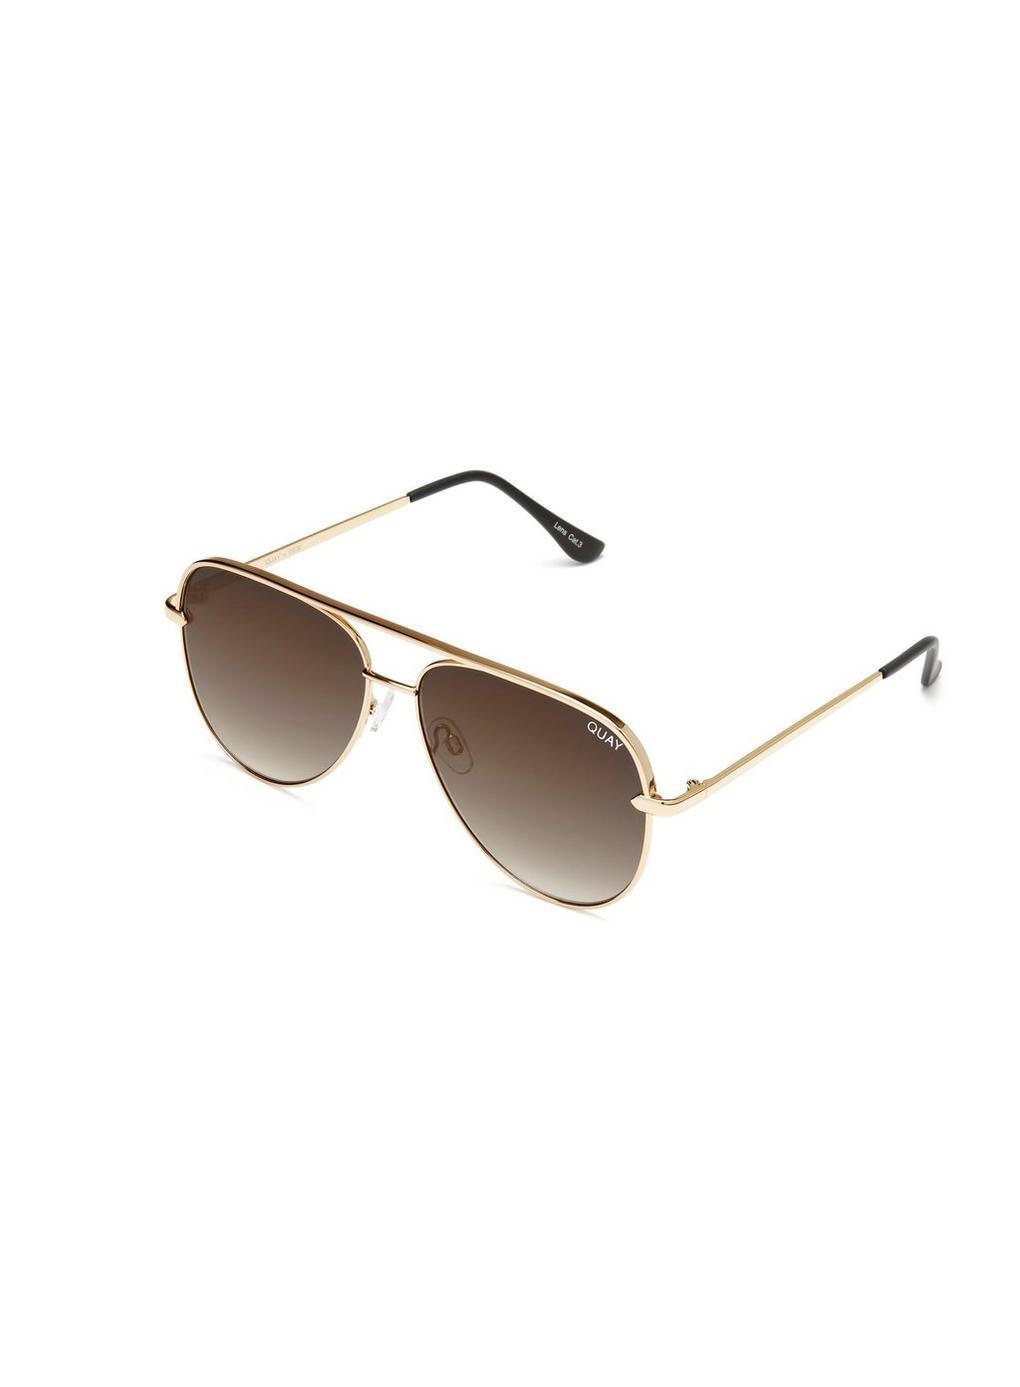 778bd26fcc ... Metallic Quay Australia Sahara Matte Gold taupe Aviator Sunglasses -  Lyst. View fullscreen